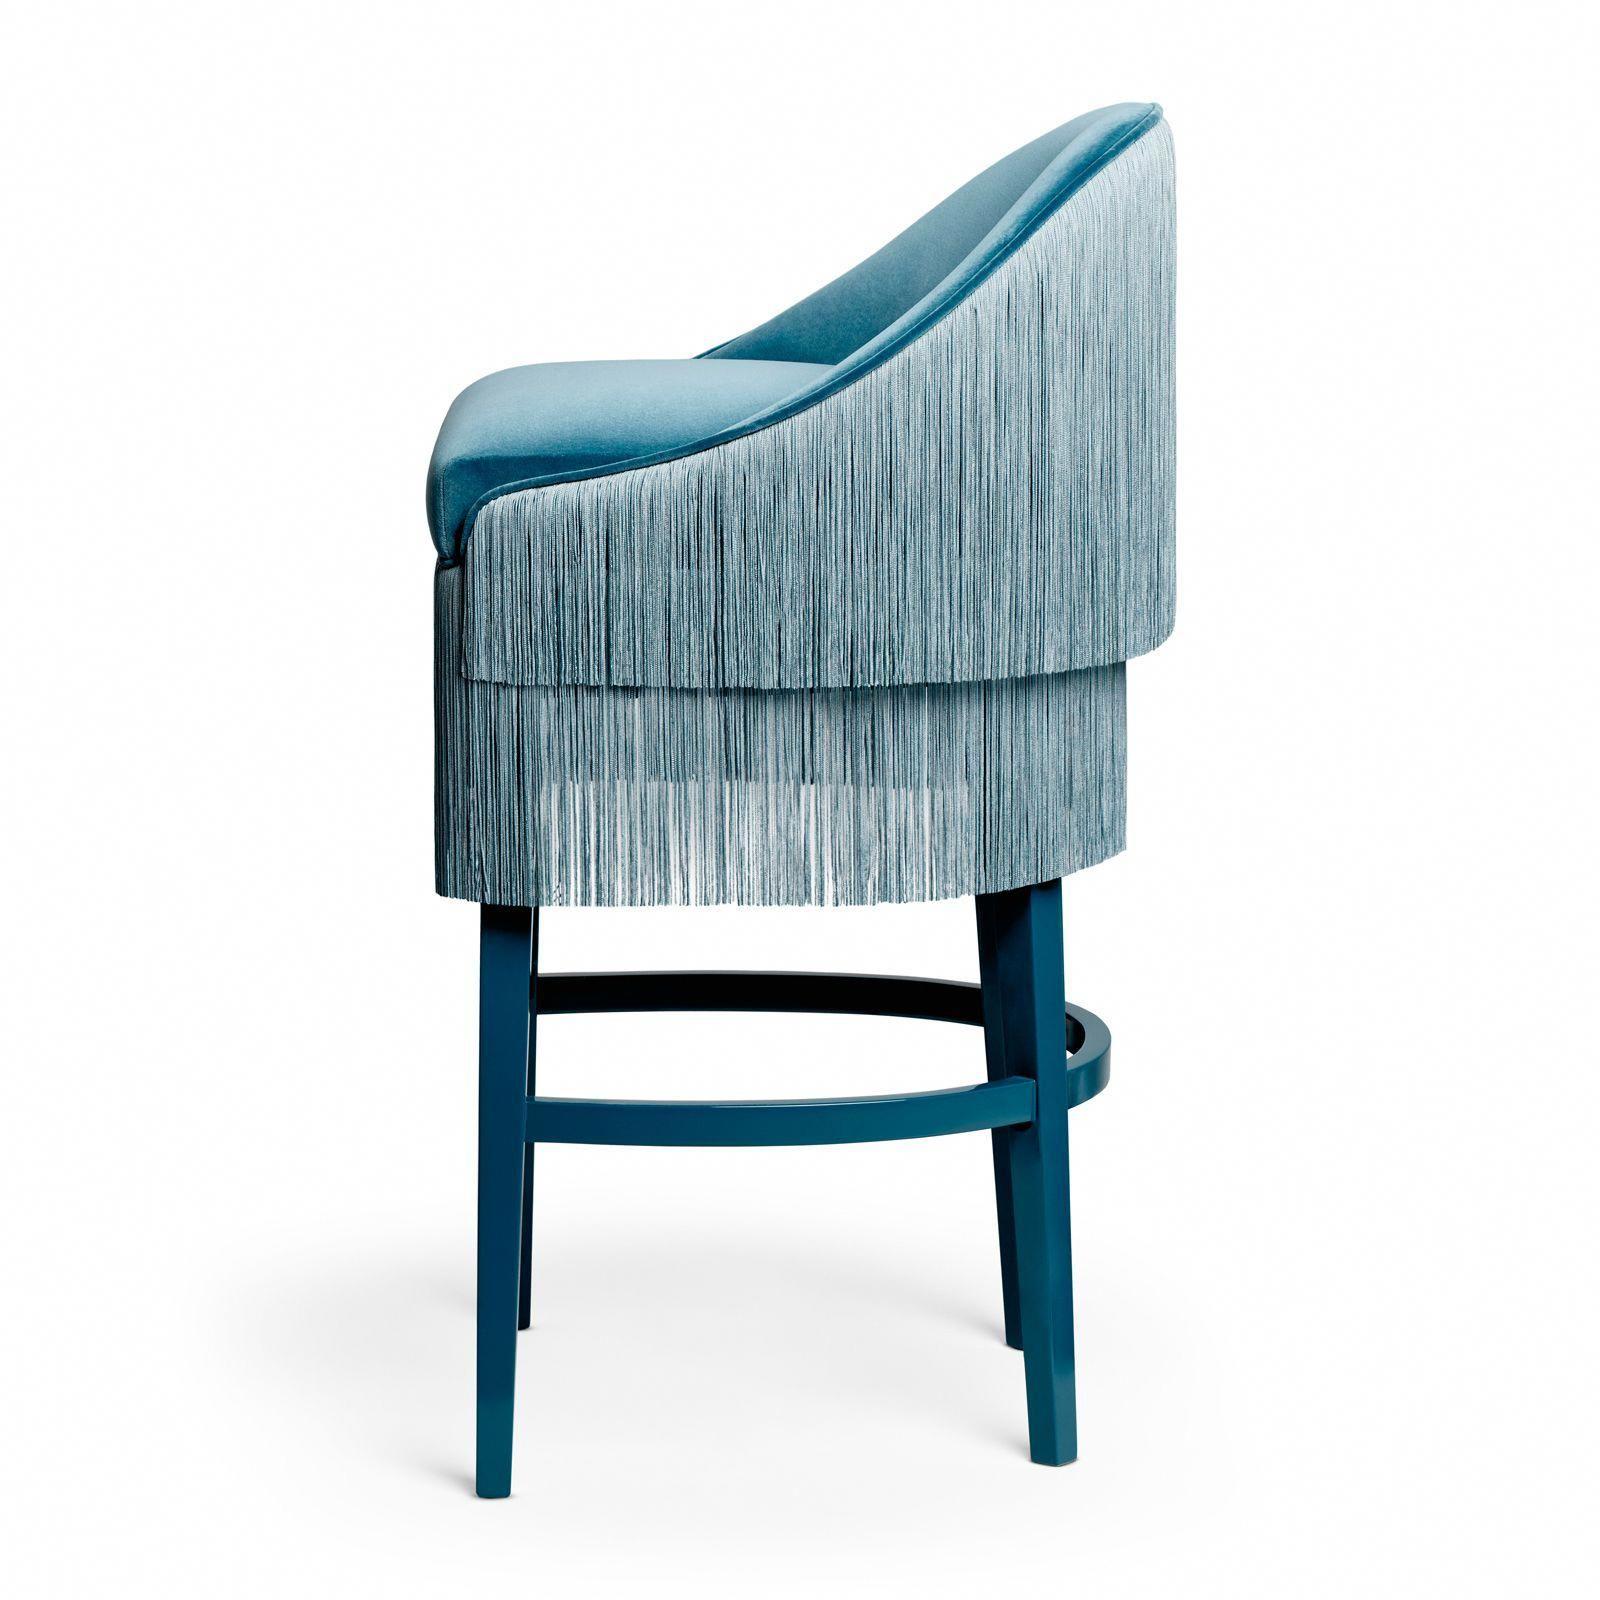 Office Bar Furniture: Fringes Bar Stool By Munna Design #smallhomebardecorideas